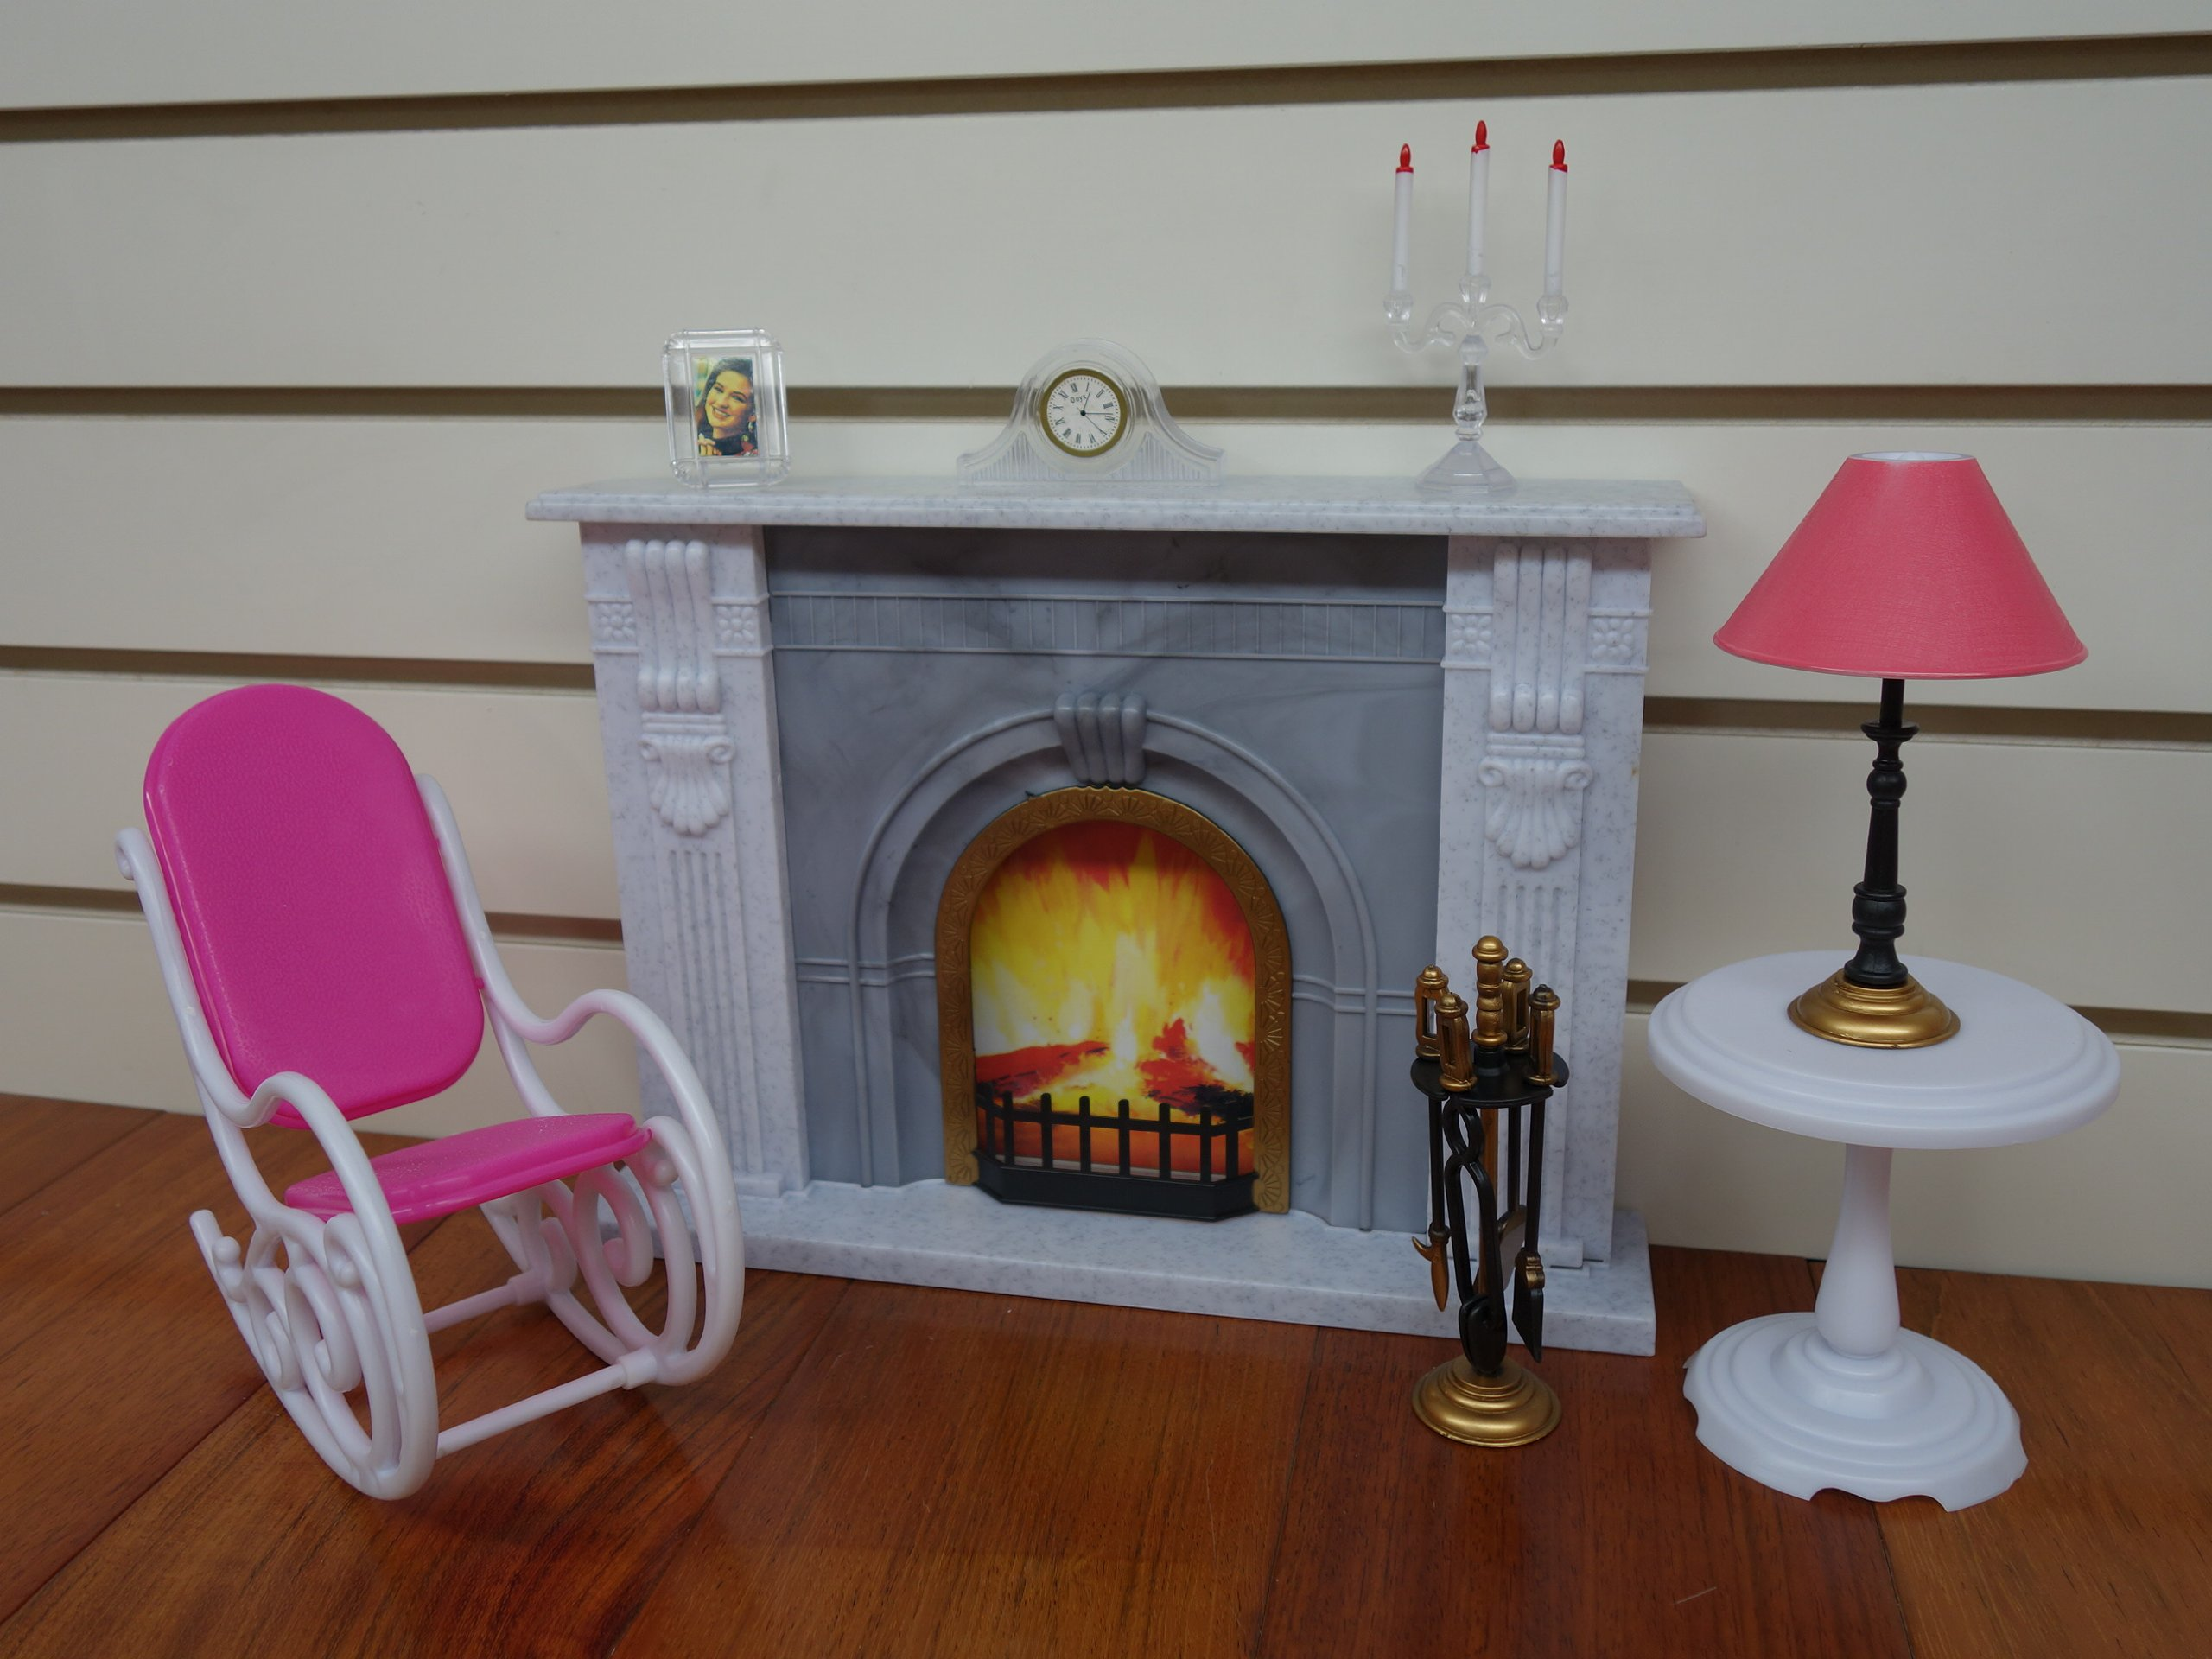 Barbie Size Gloria Fireplace Play Set